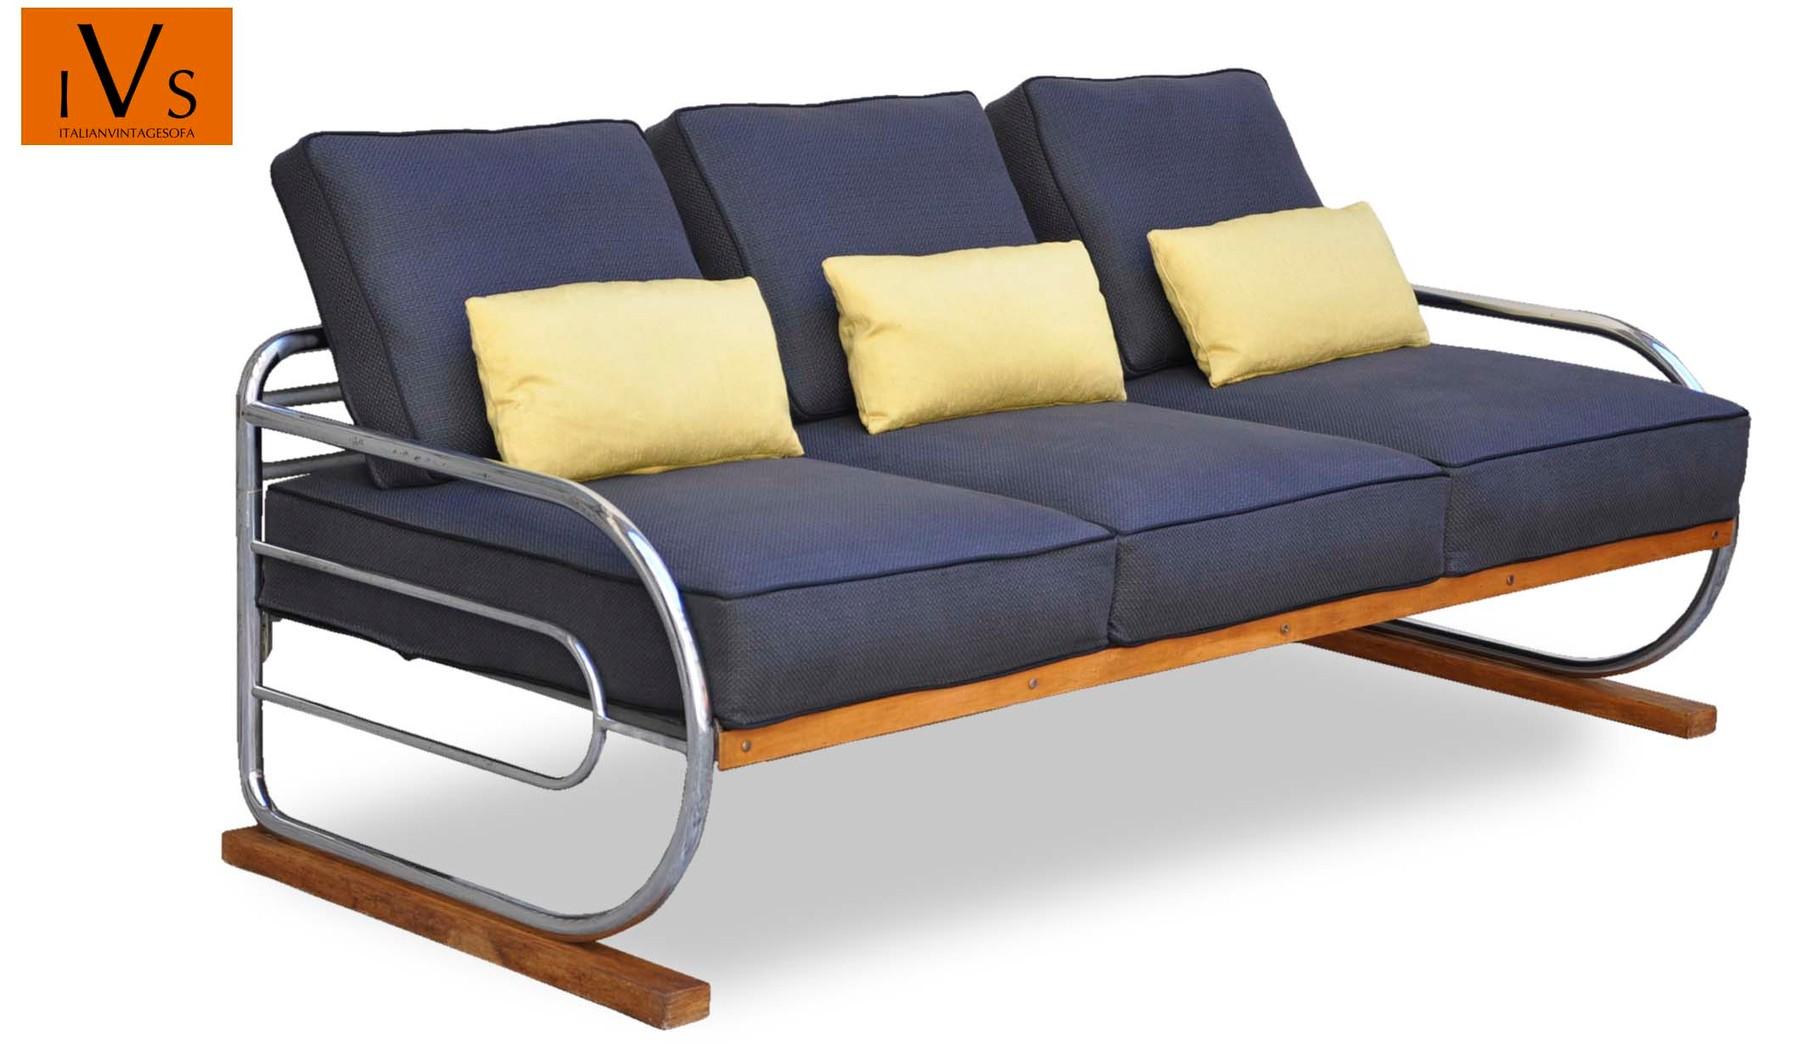 Divano razionalista bauhaus vintage cromato deco italian vintage sofa - Divano anni 30 ...